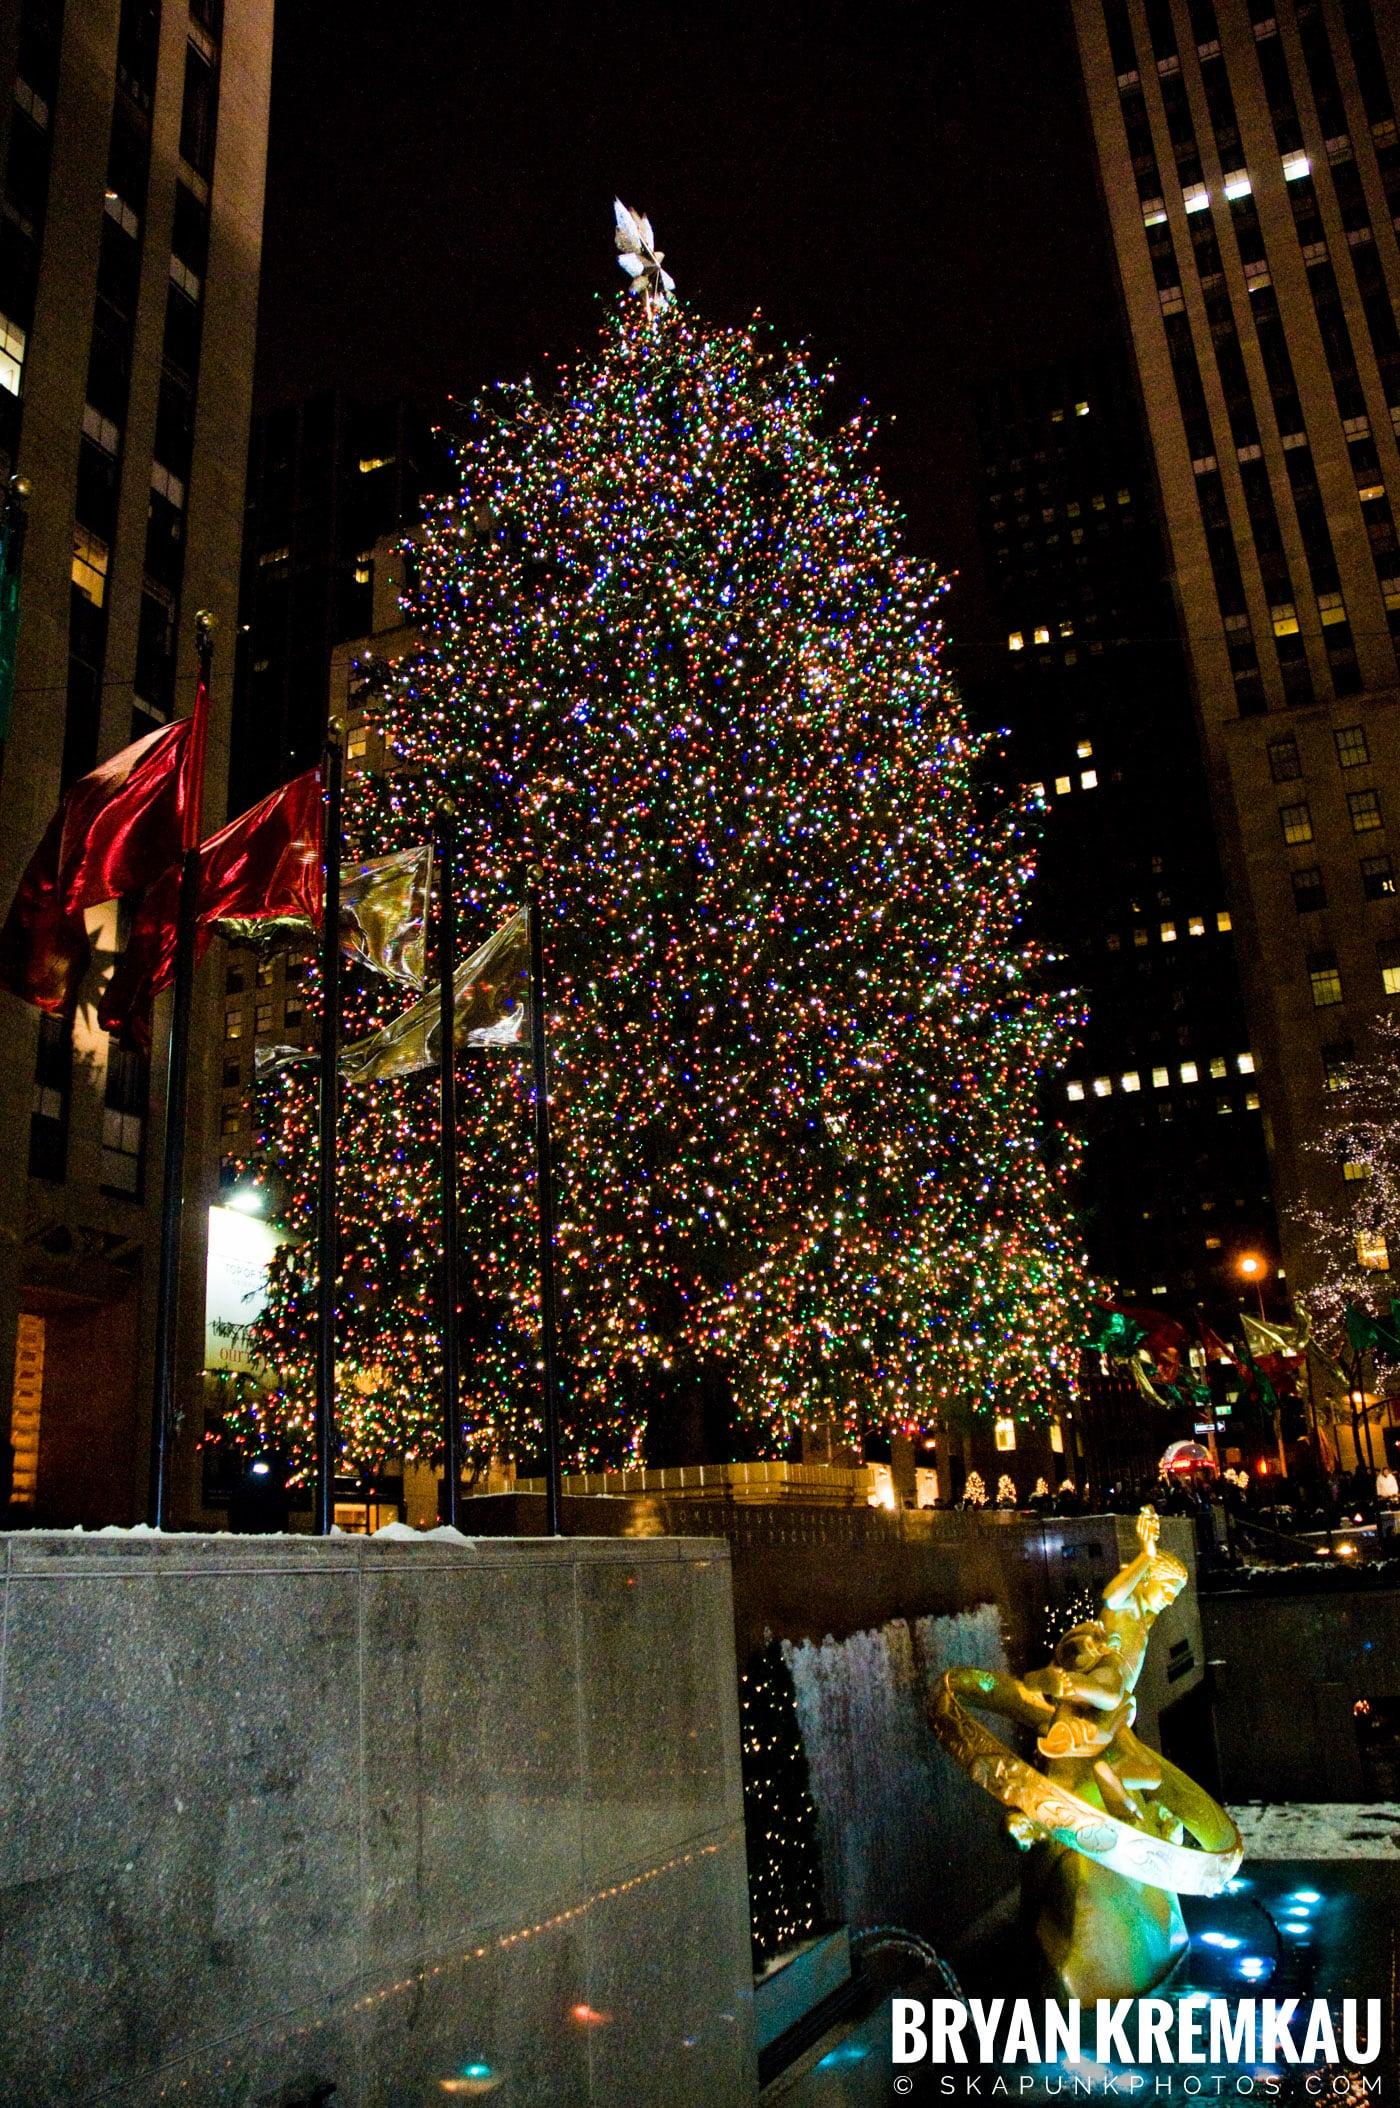 NYC Holiday Trip - 12.20.08 (2)